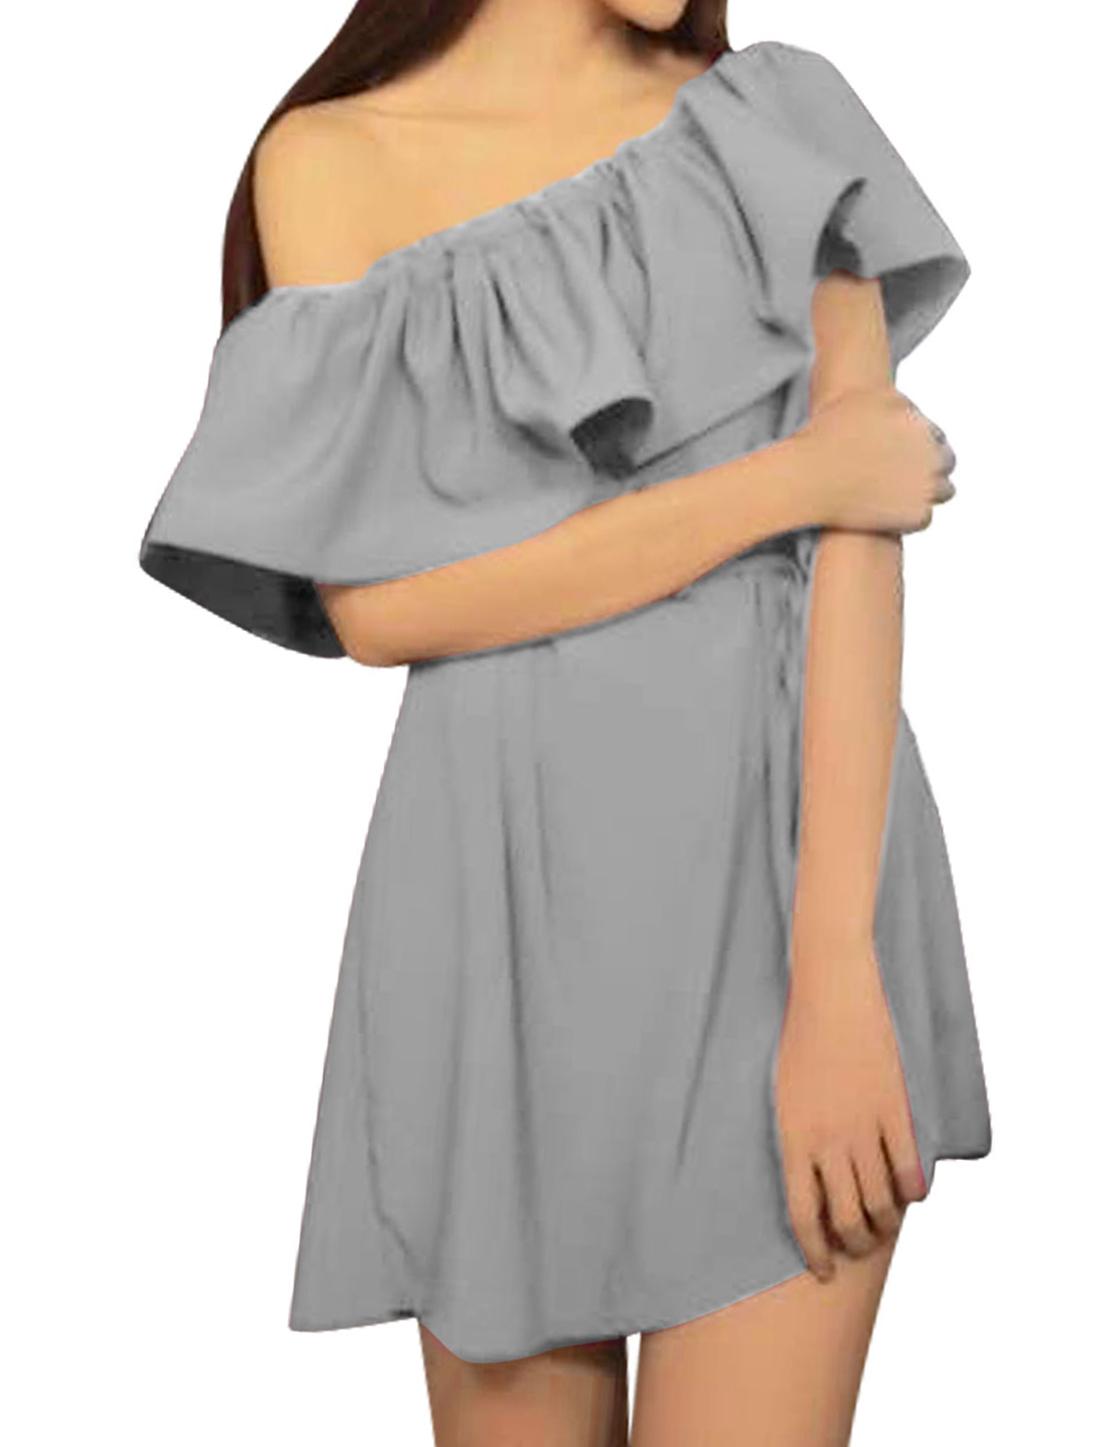 Ladies Off Shoulder Flounced Upper Unlined A-Line Dress Gray S